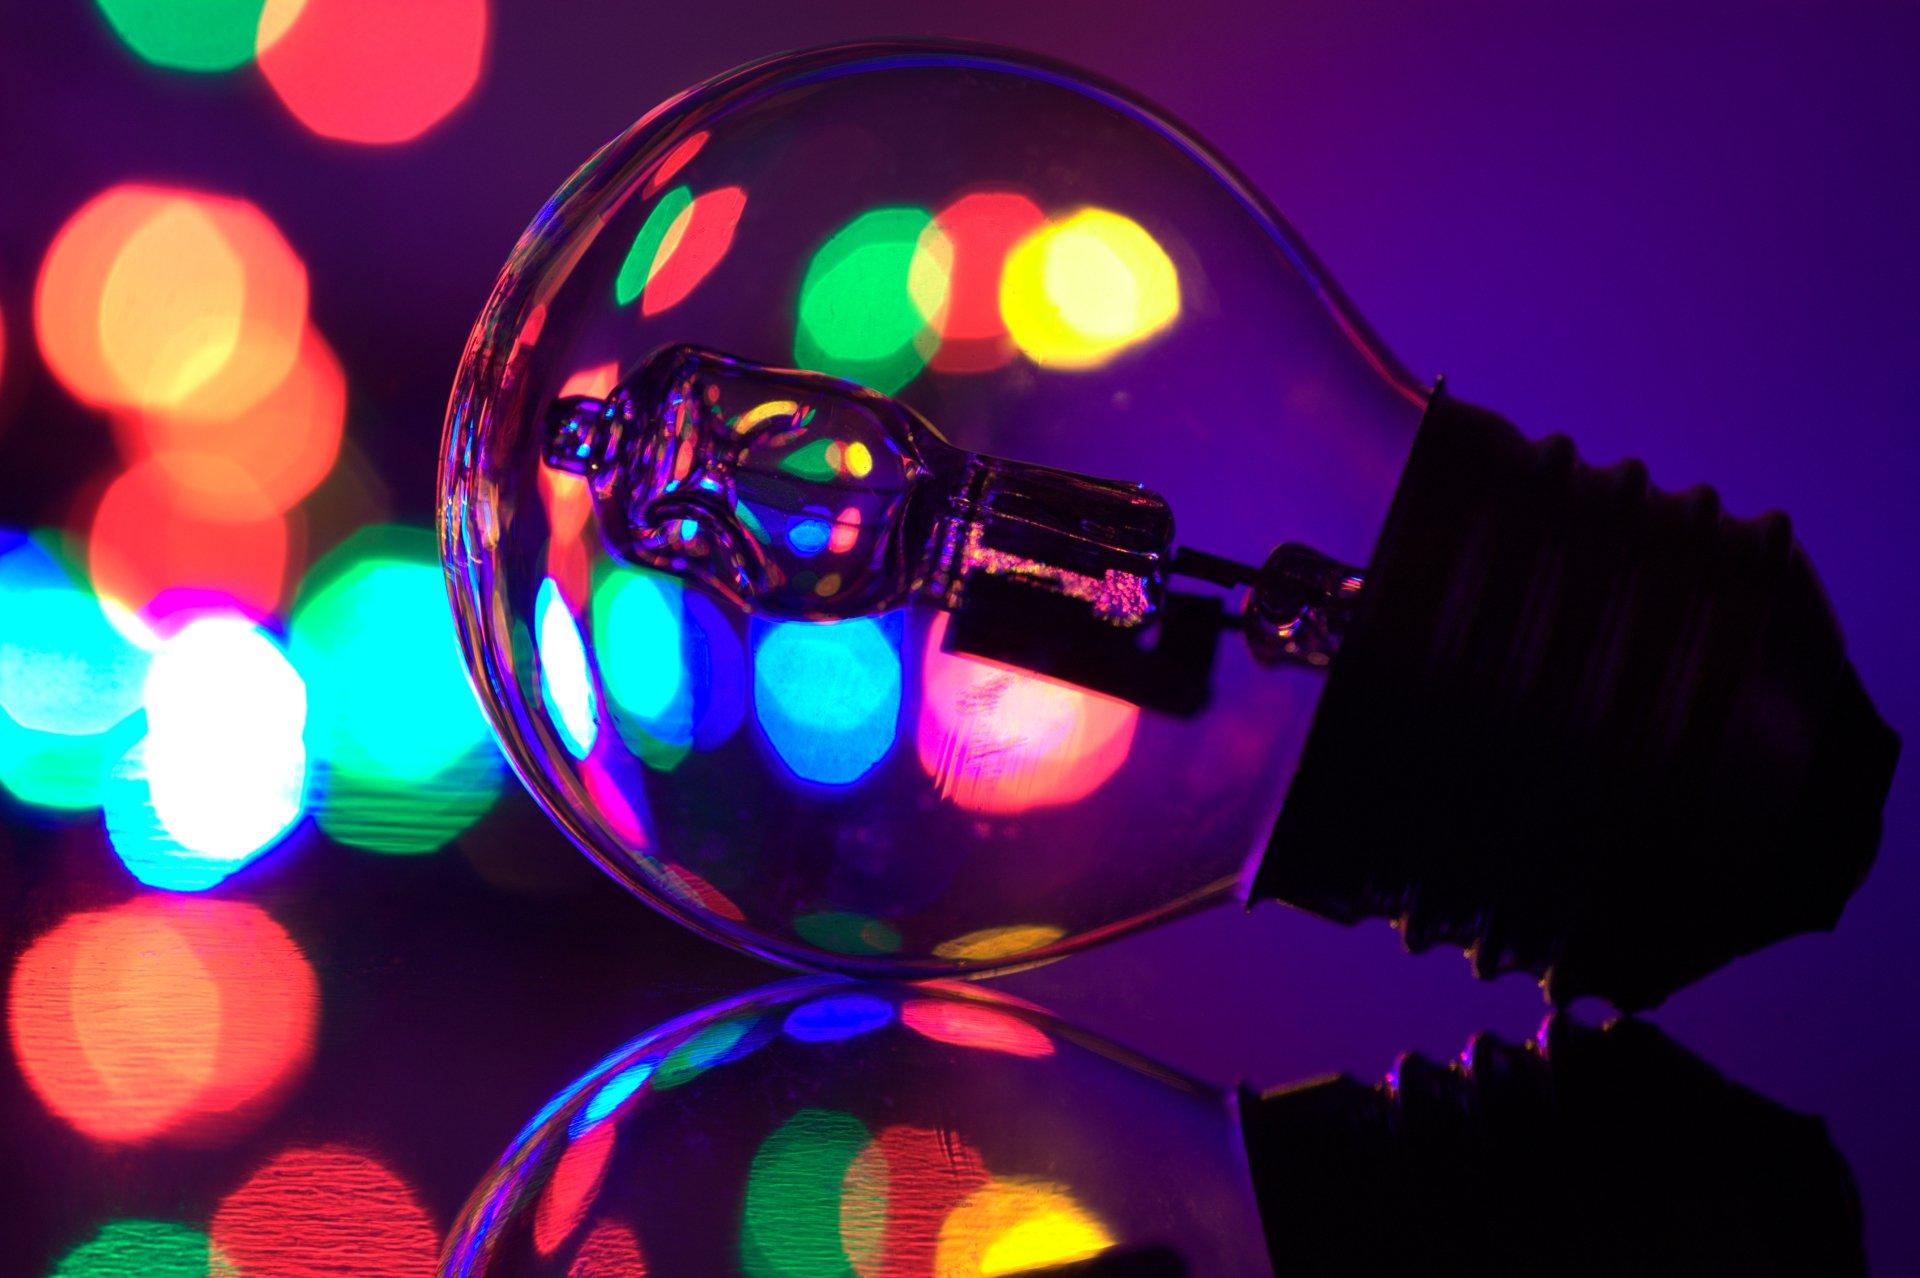 Man Made - Light Bulb  Reflection Close-Up Bokeh Colors Wallpaper